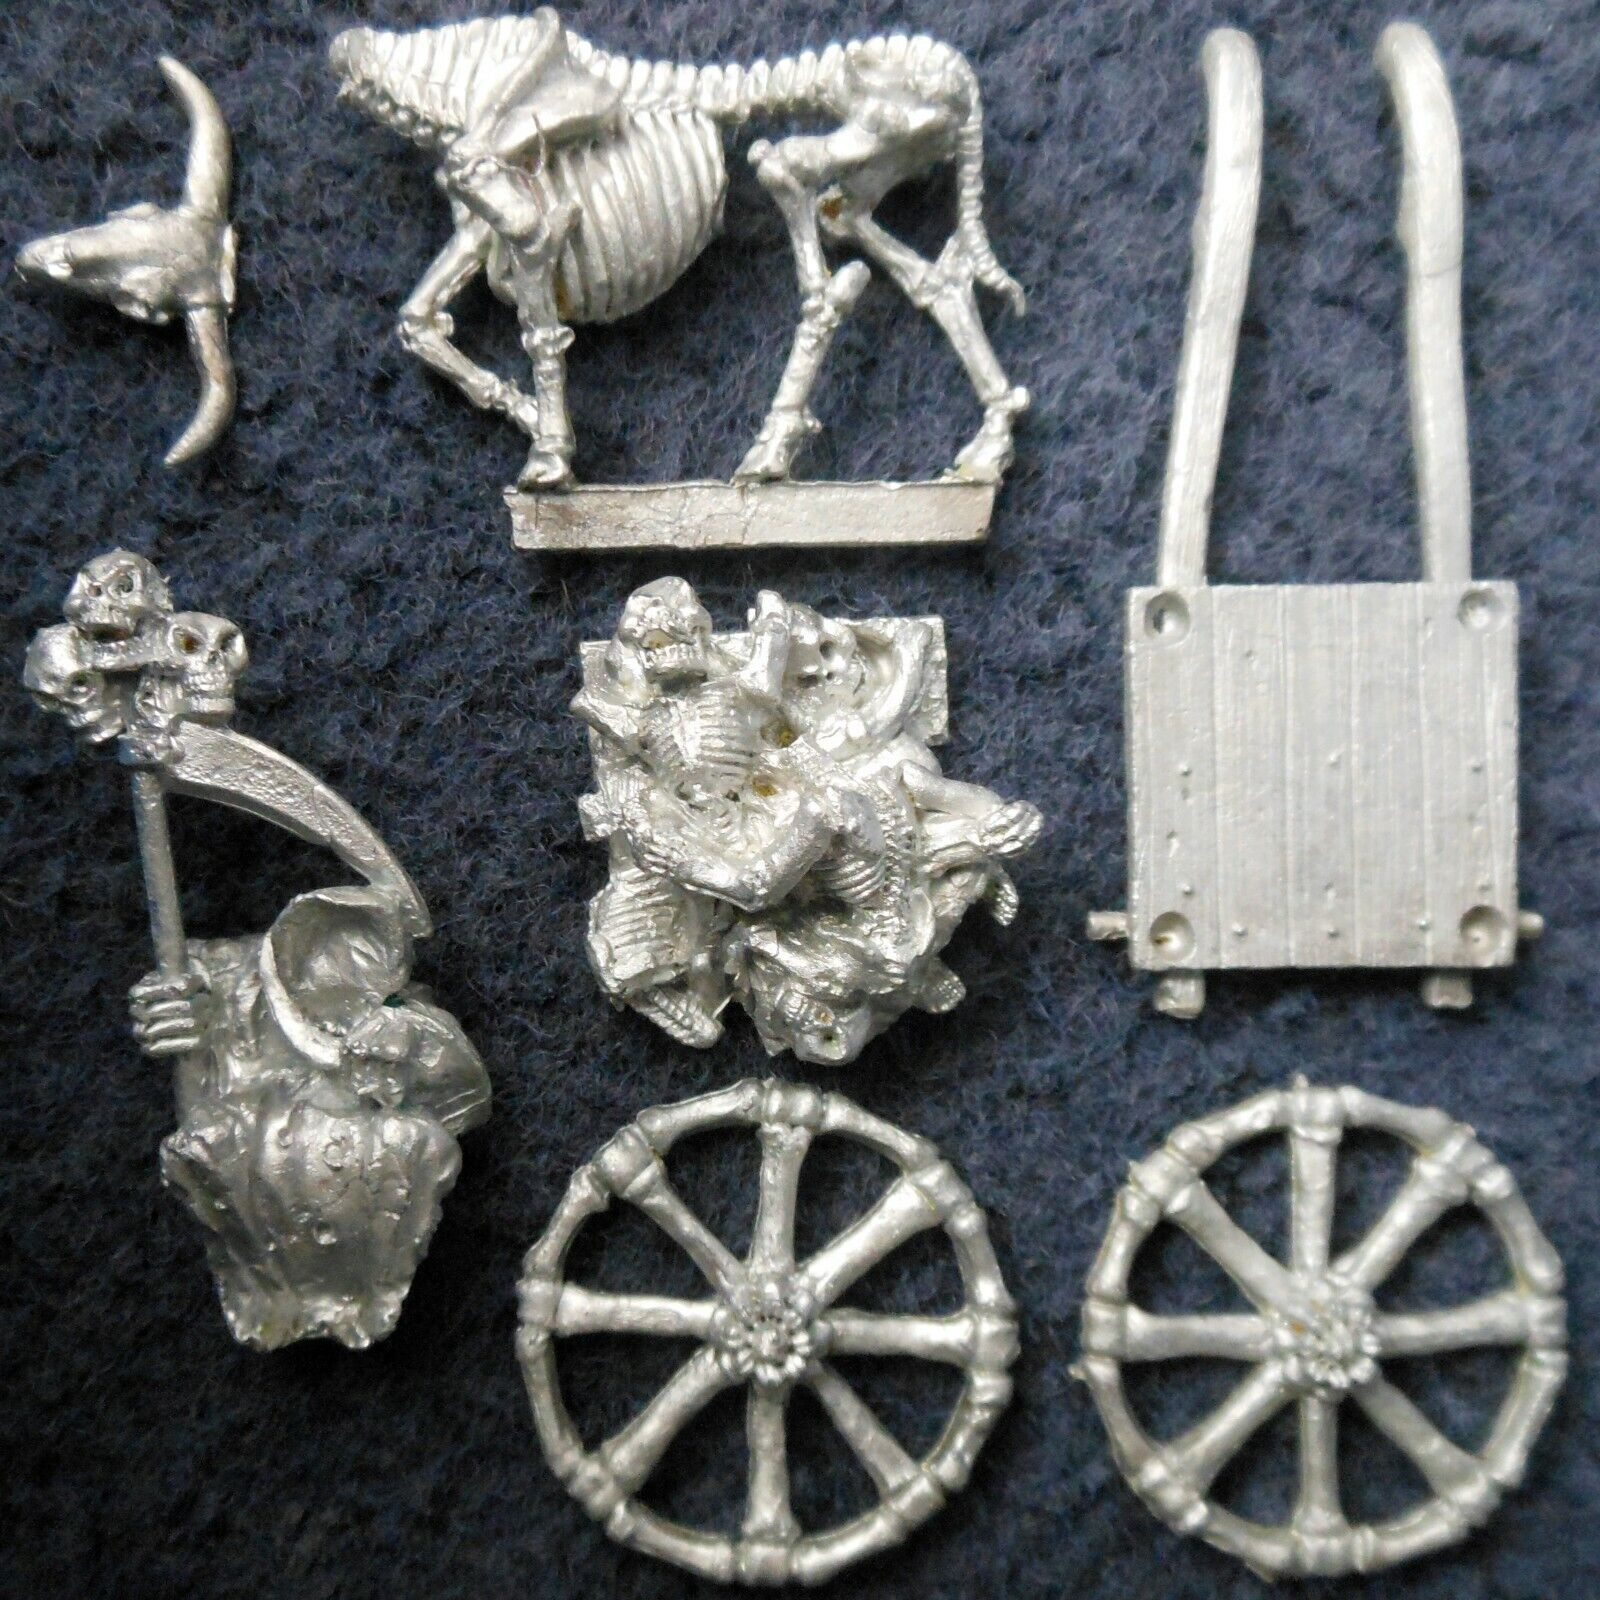 1987 Undead C22 Plague Cart Skeleton Citadel Warhammer Wraith Nurgle Chariot GW